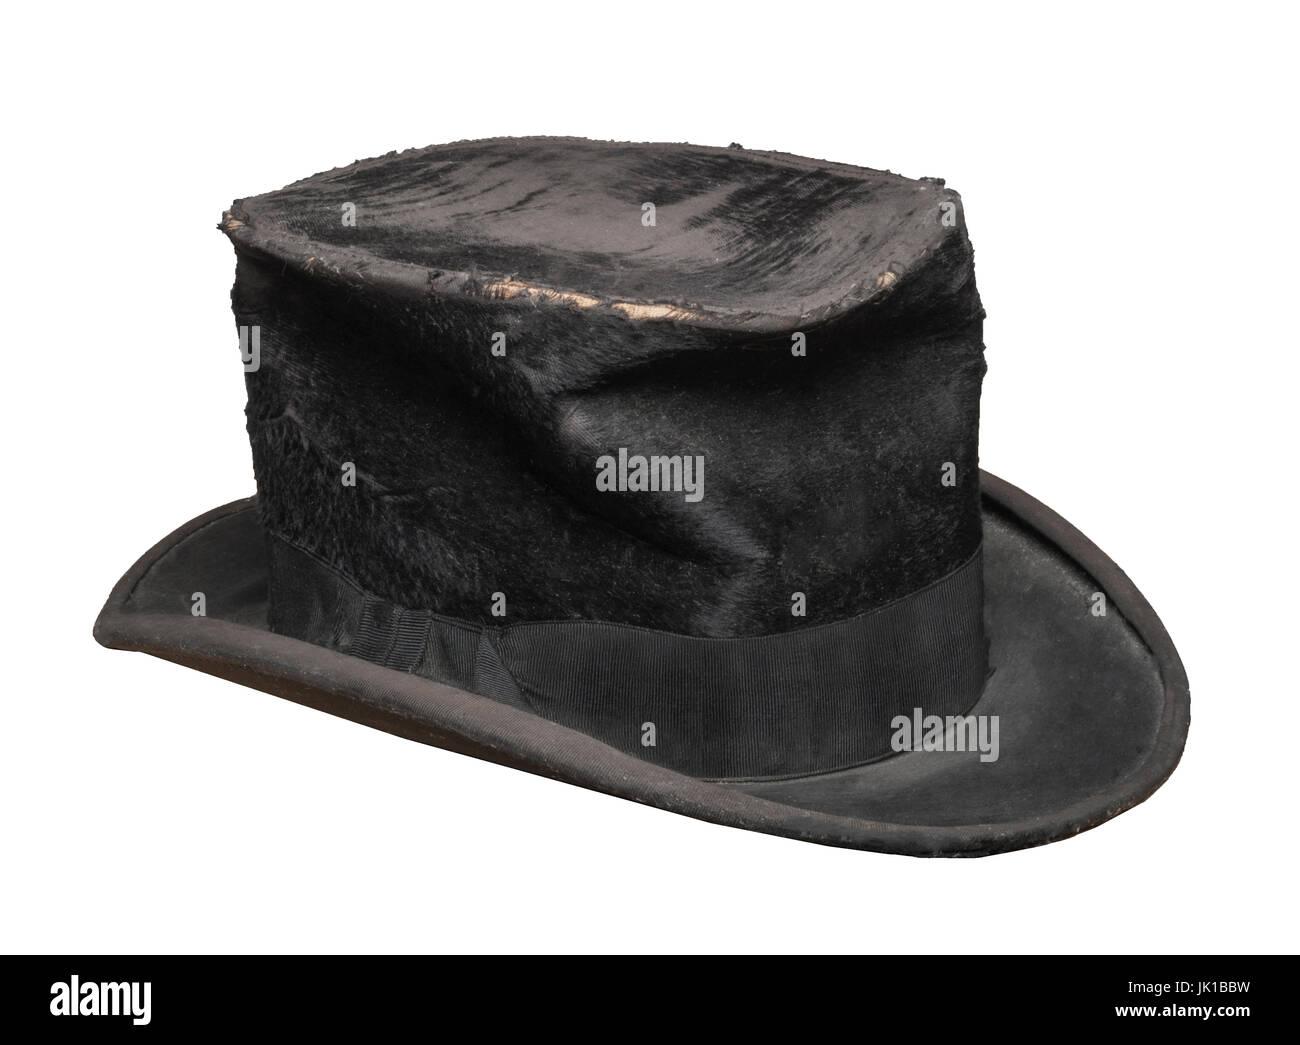 Old Black Top Hat - Stock Image